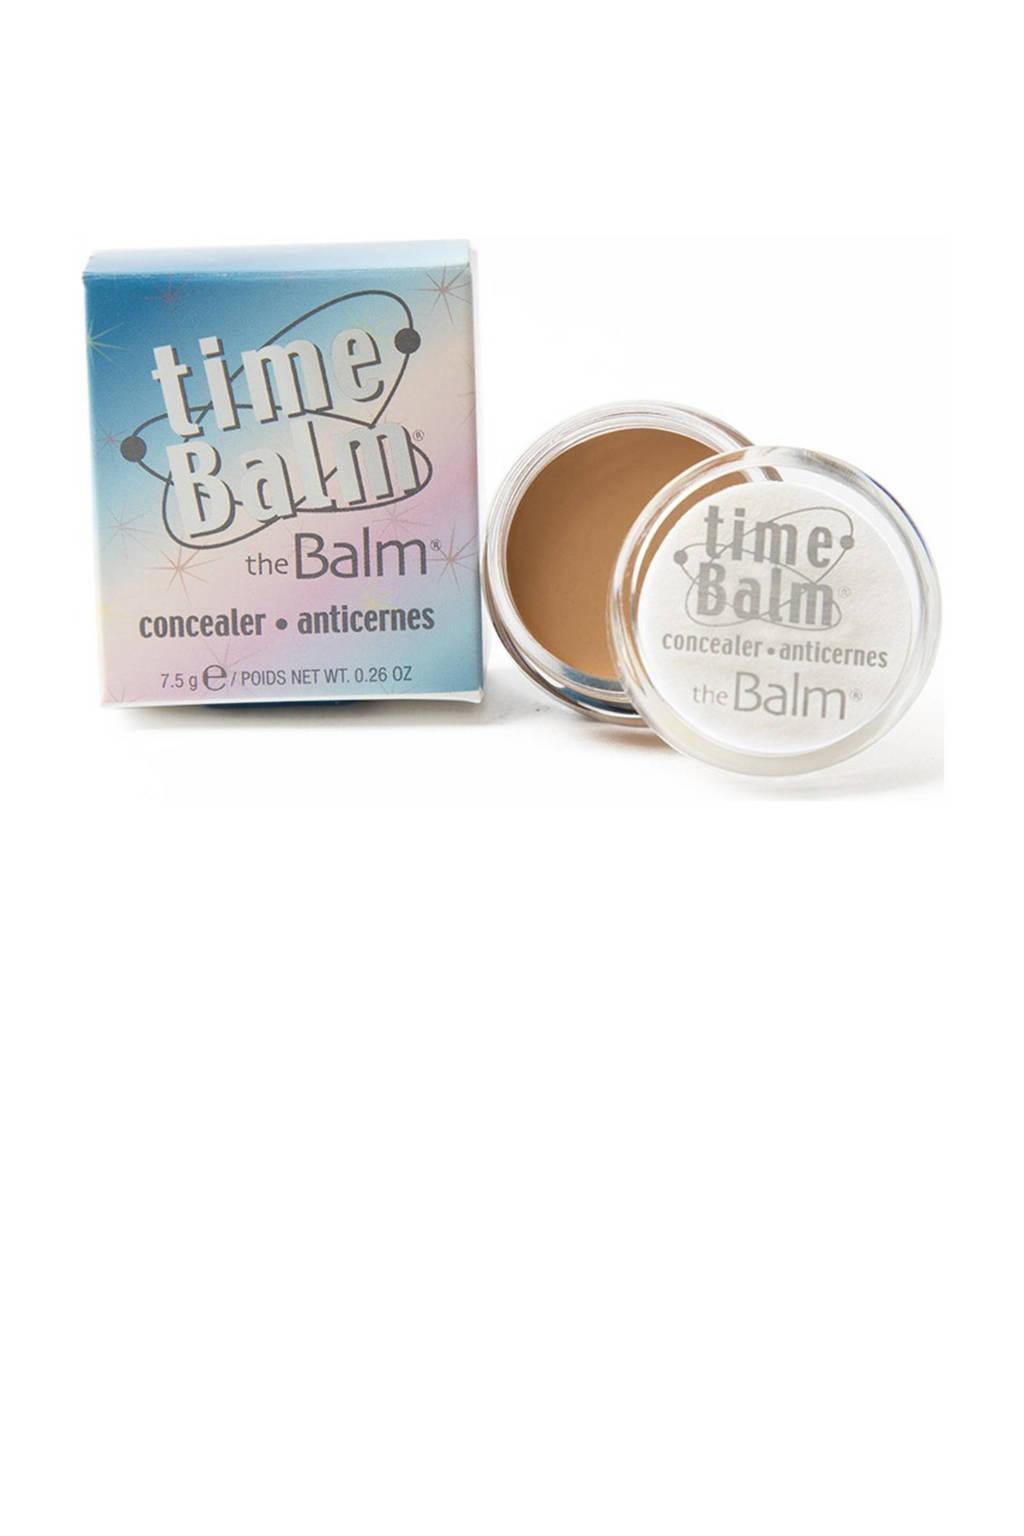 The Balm timeBalm concealer - Just before Dark, just before dark